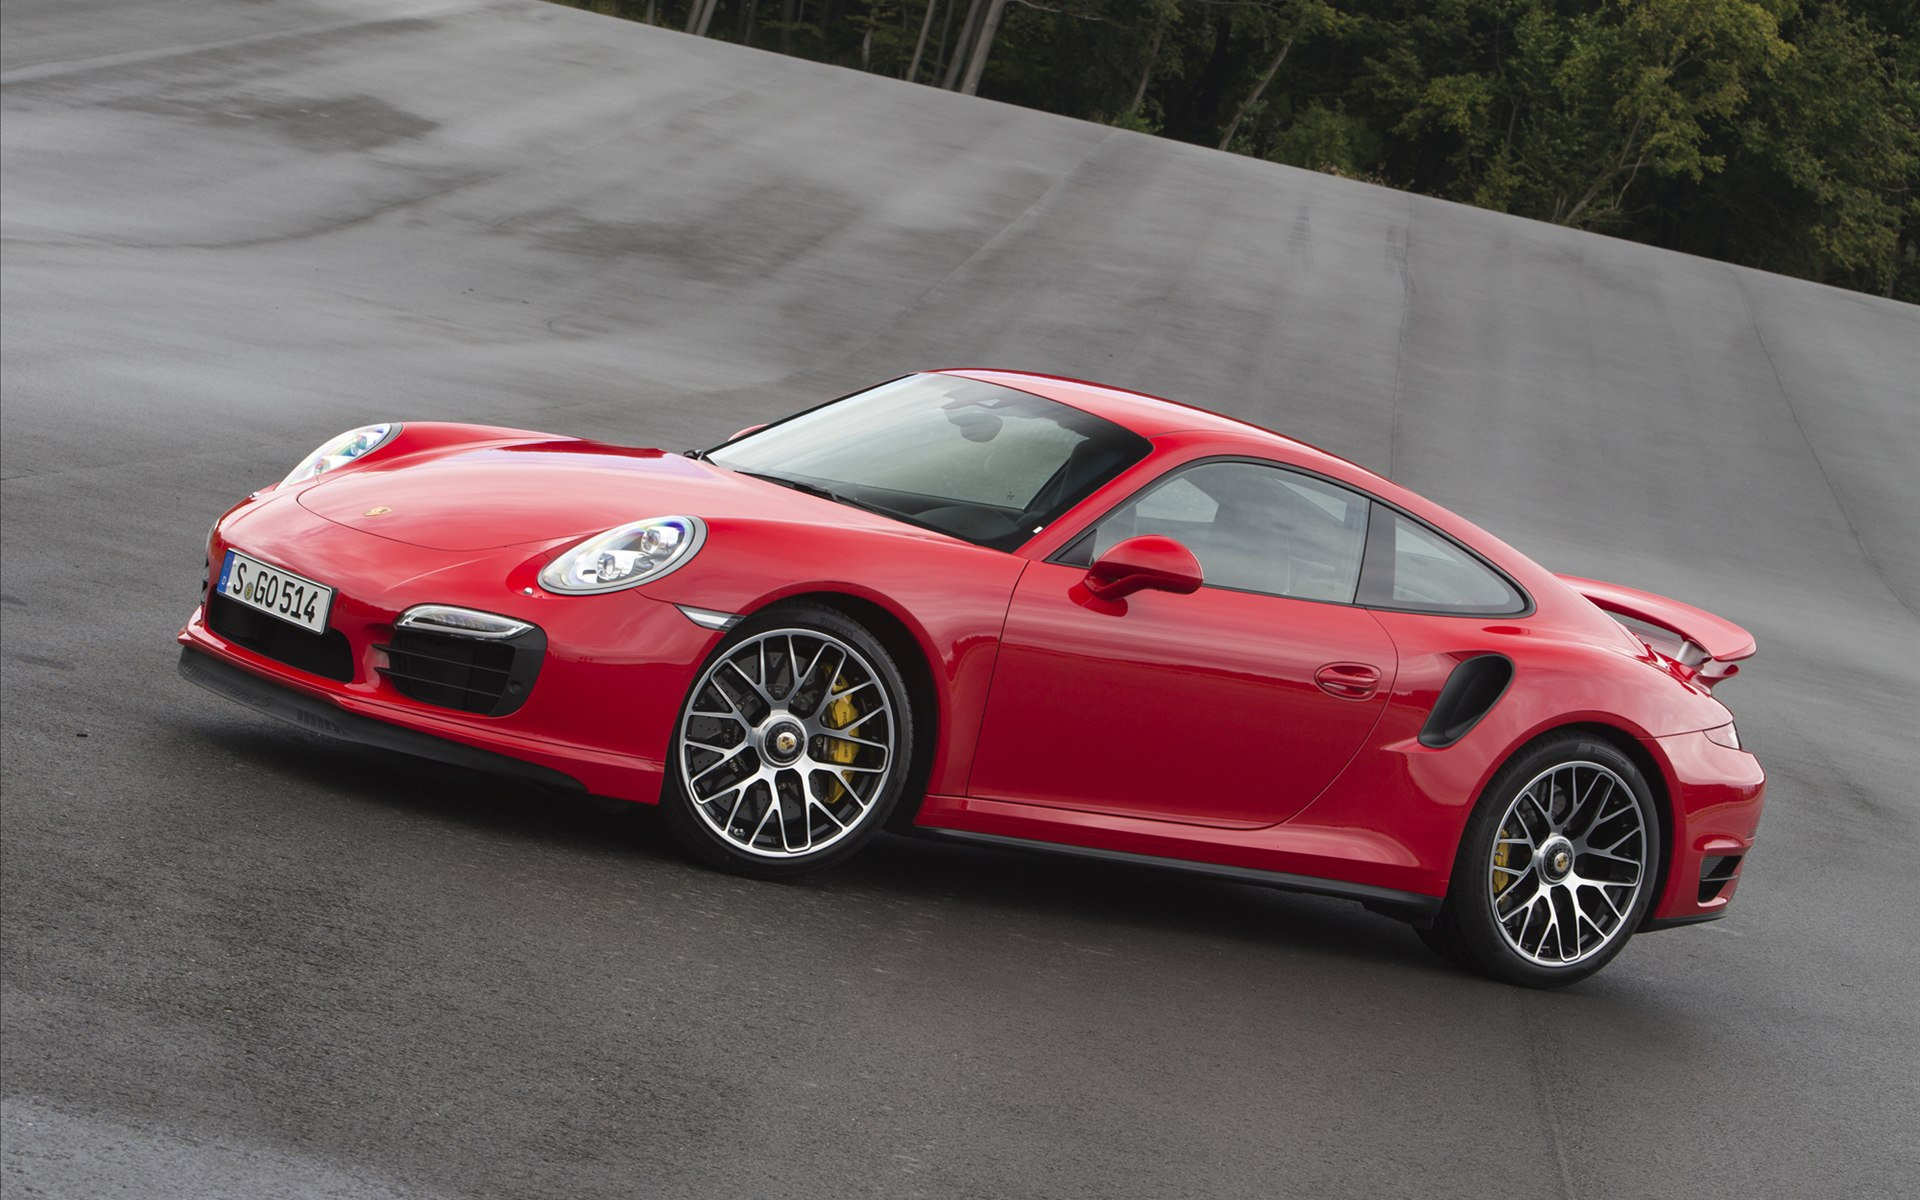 porsche 911 turbo s wallpaper wallpapersafari - Porsche 911 Turbo 2014 Wallpaper